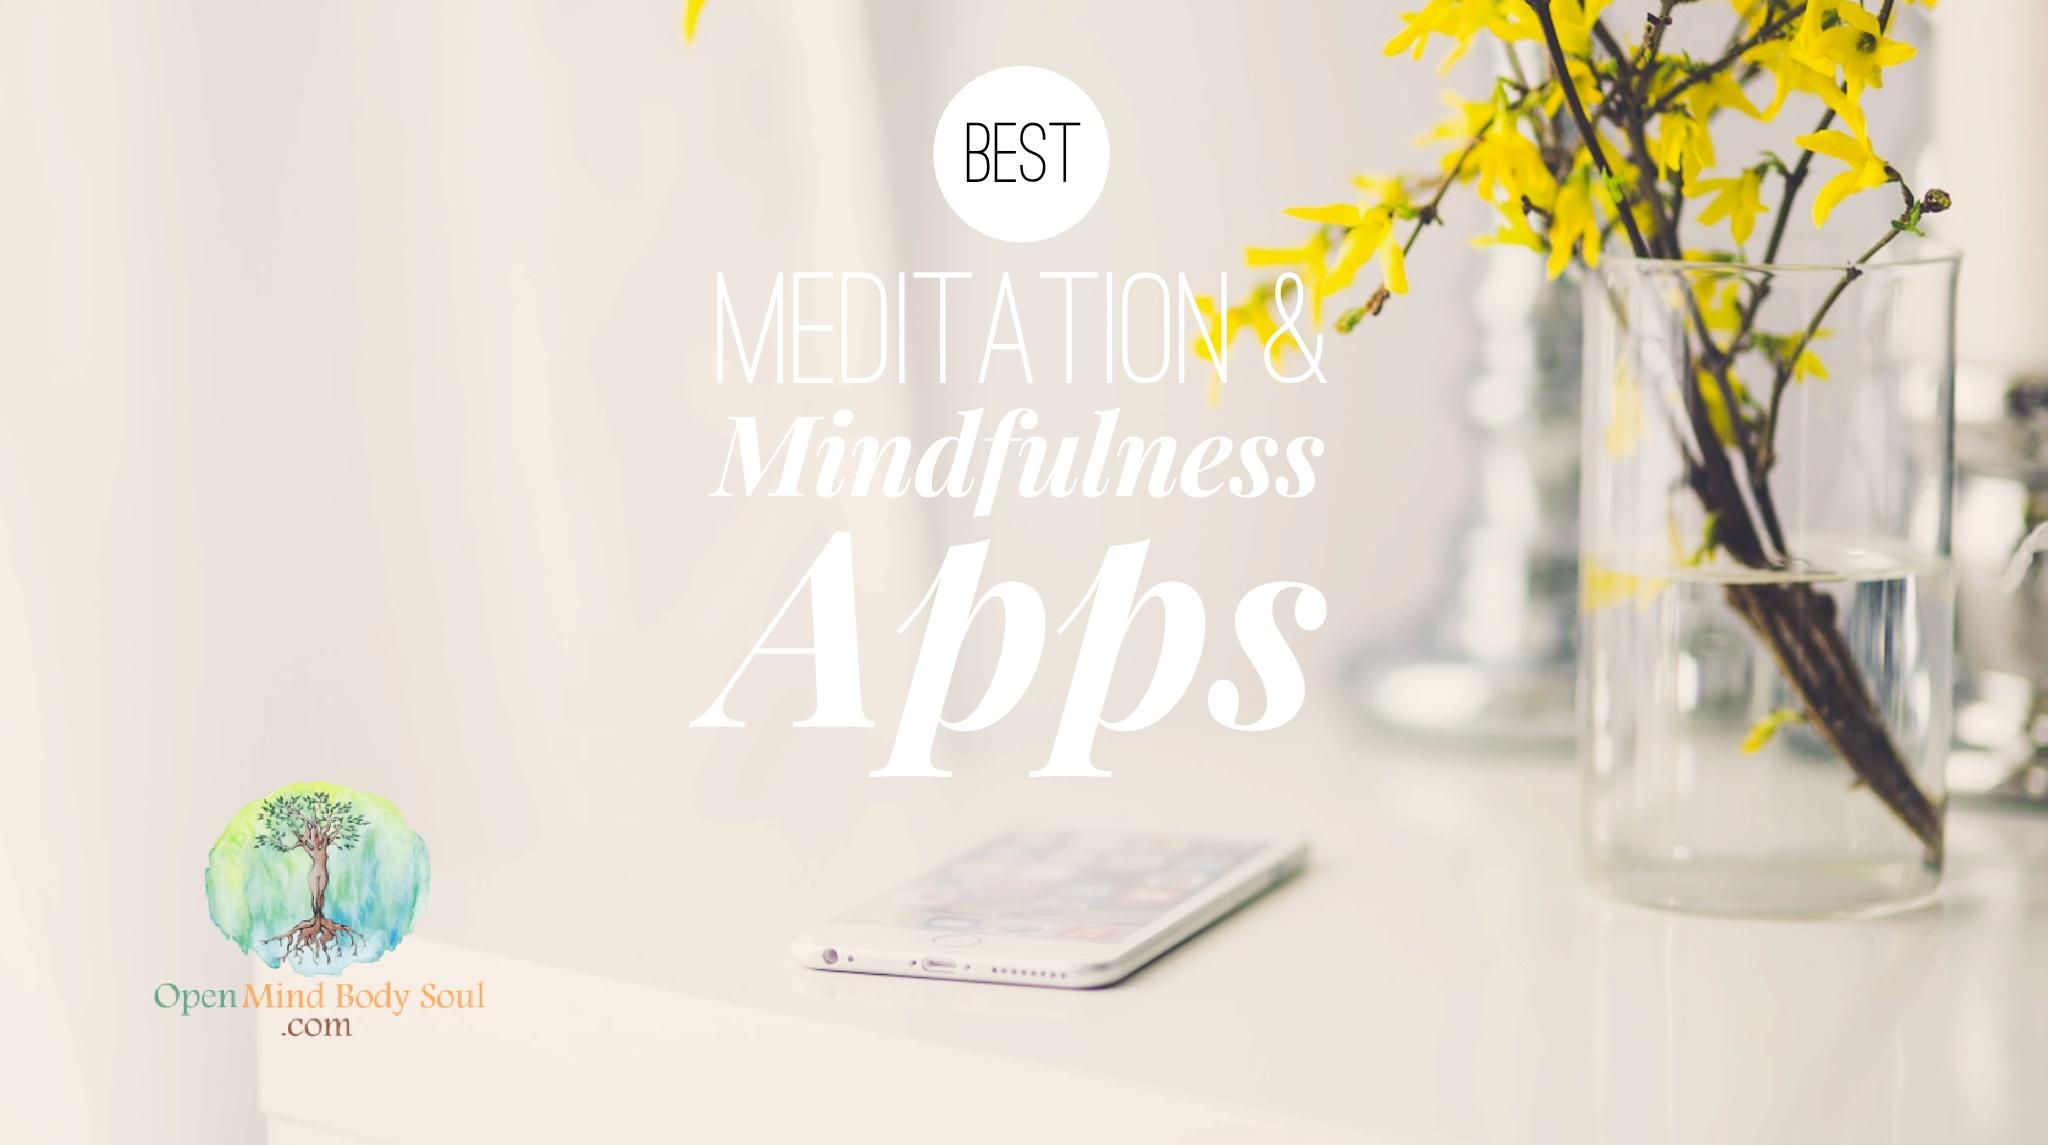 best-meditation-mindfulness-app-music